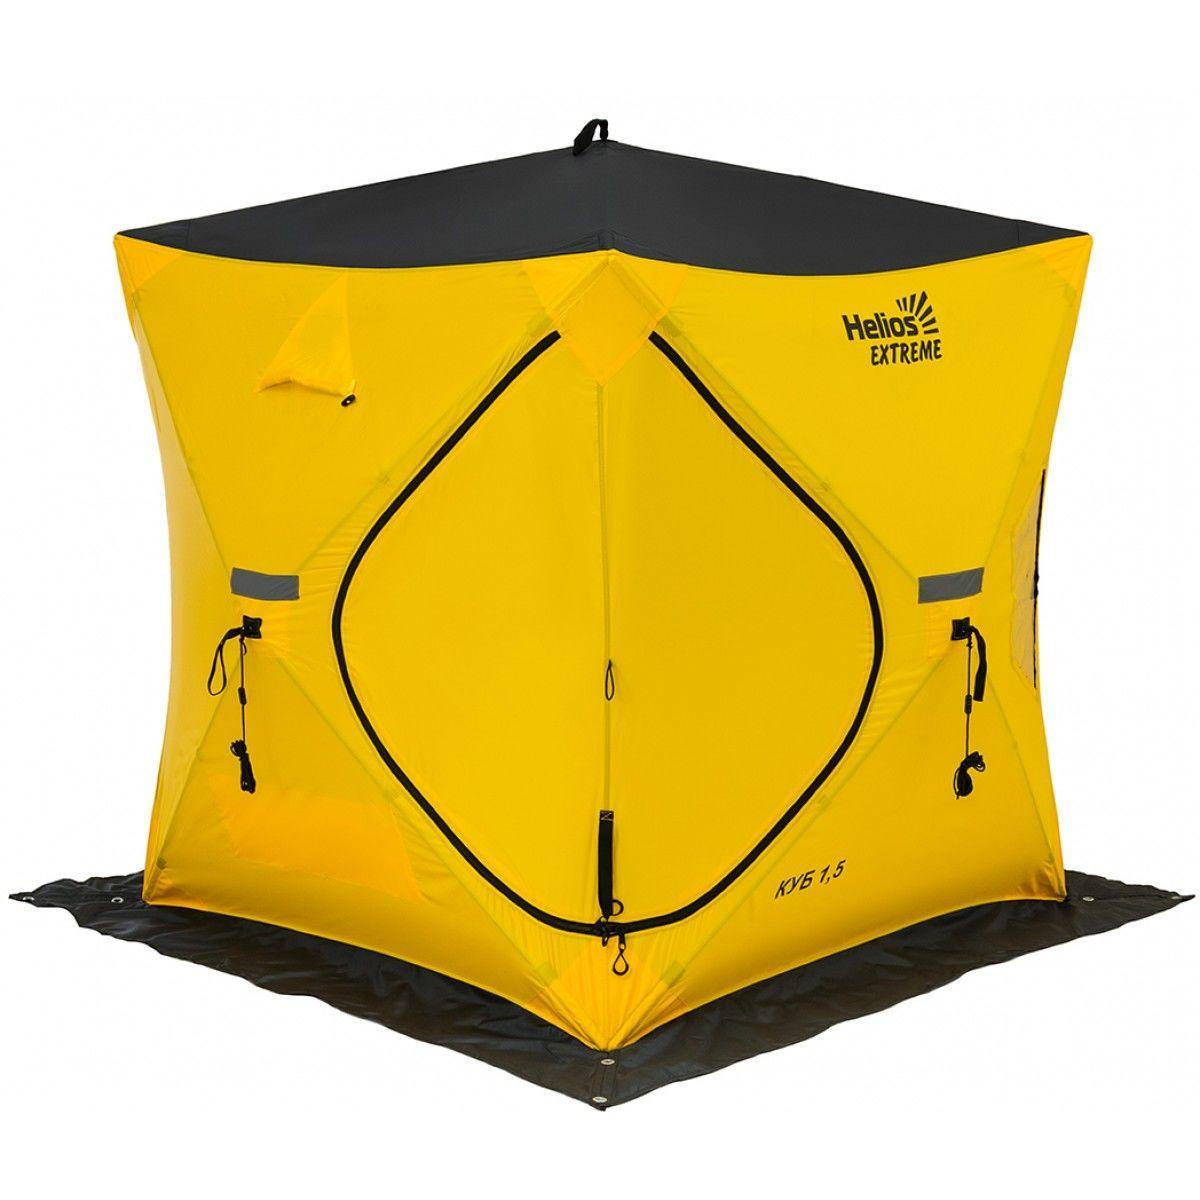 Палатка зимняя КУБ EXTREME 1,5х1,5 v2.0 (широкий вход) Helios 171395 - фото 2